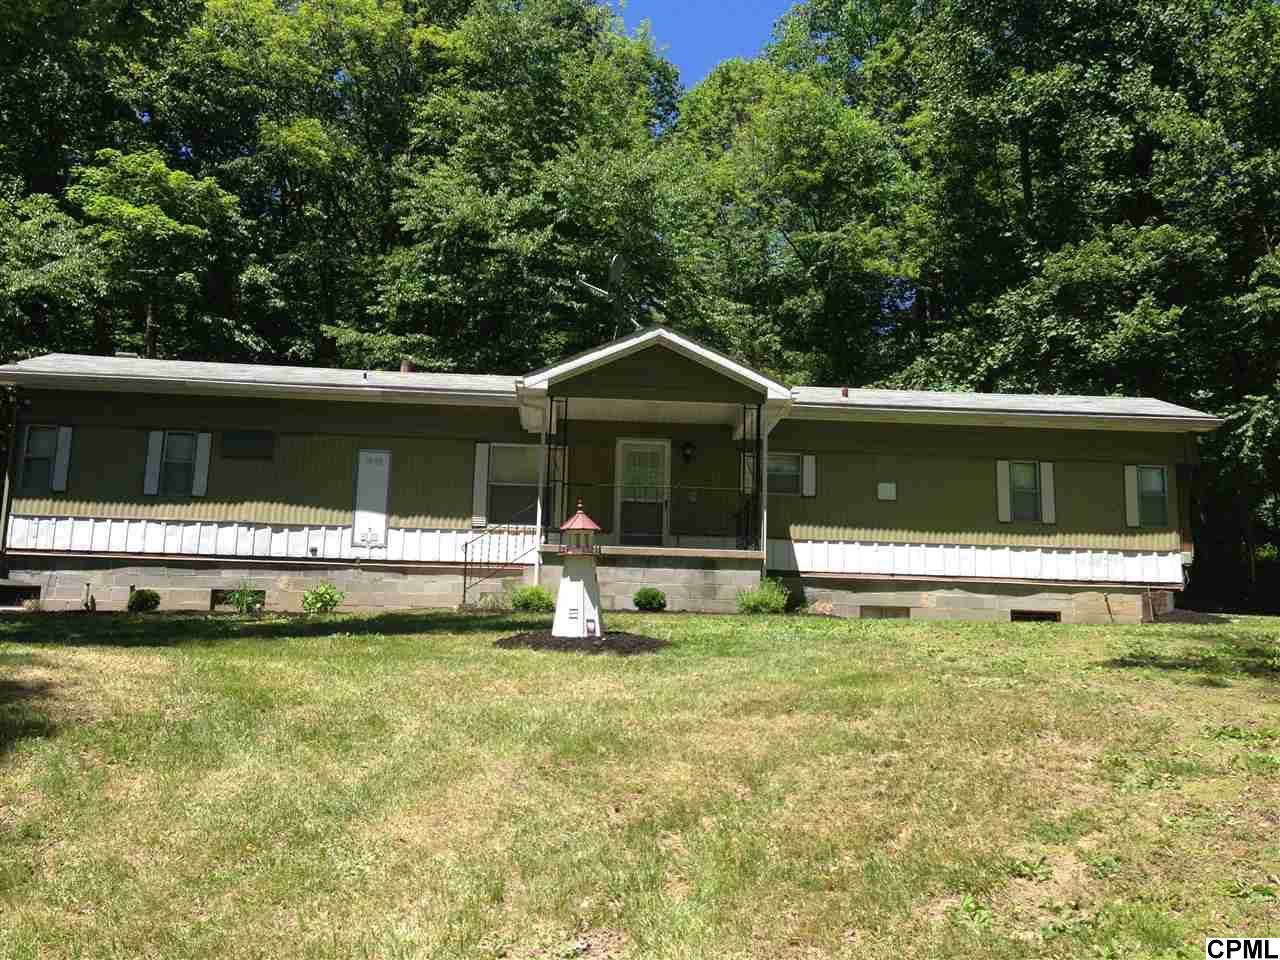 Real Estate for Sale, ListingId: 32413879, Huntingdon,PA16652